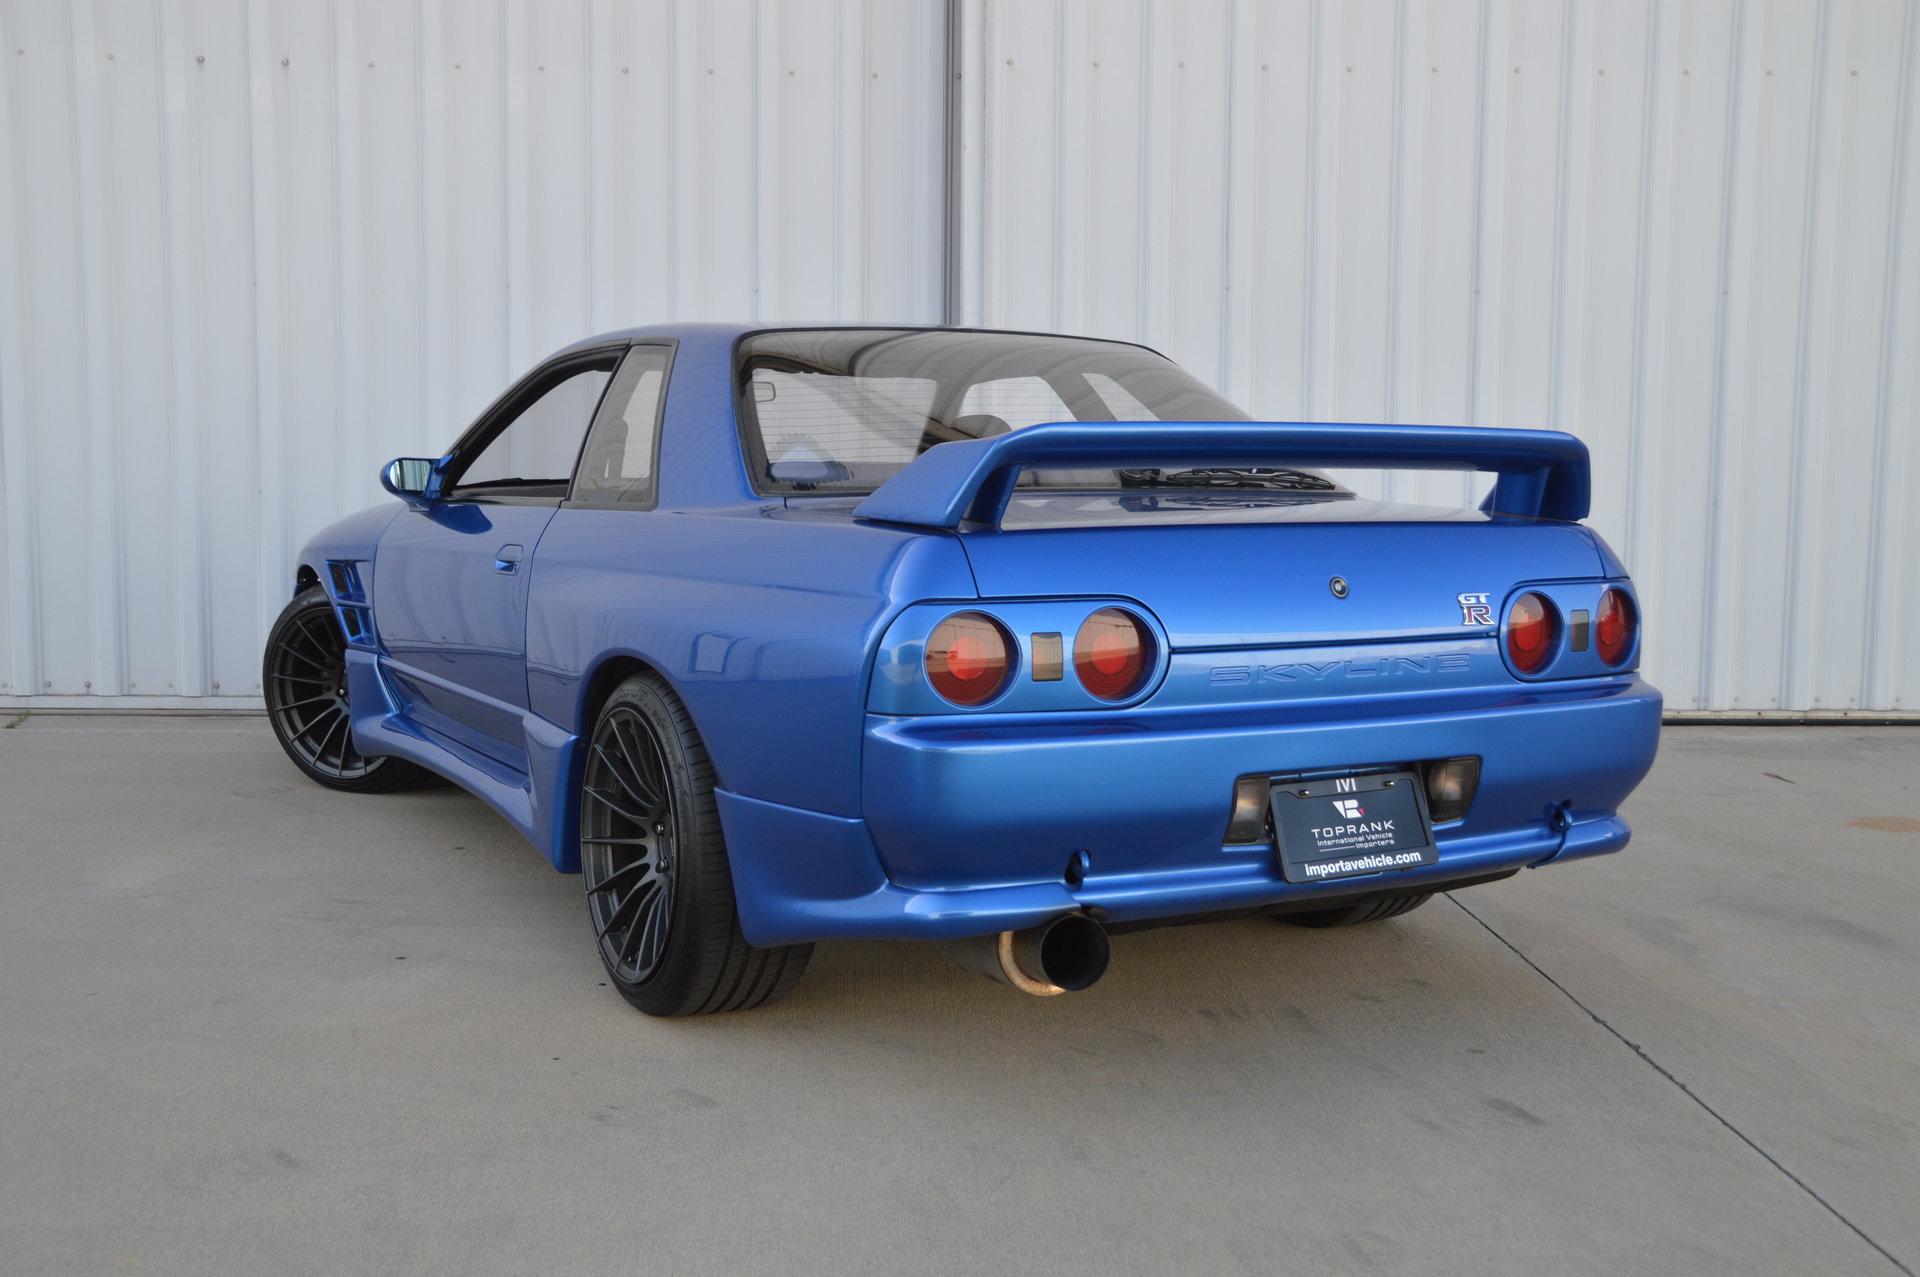 1990 Nissan Skyline GT-R | Toprank Motorworks